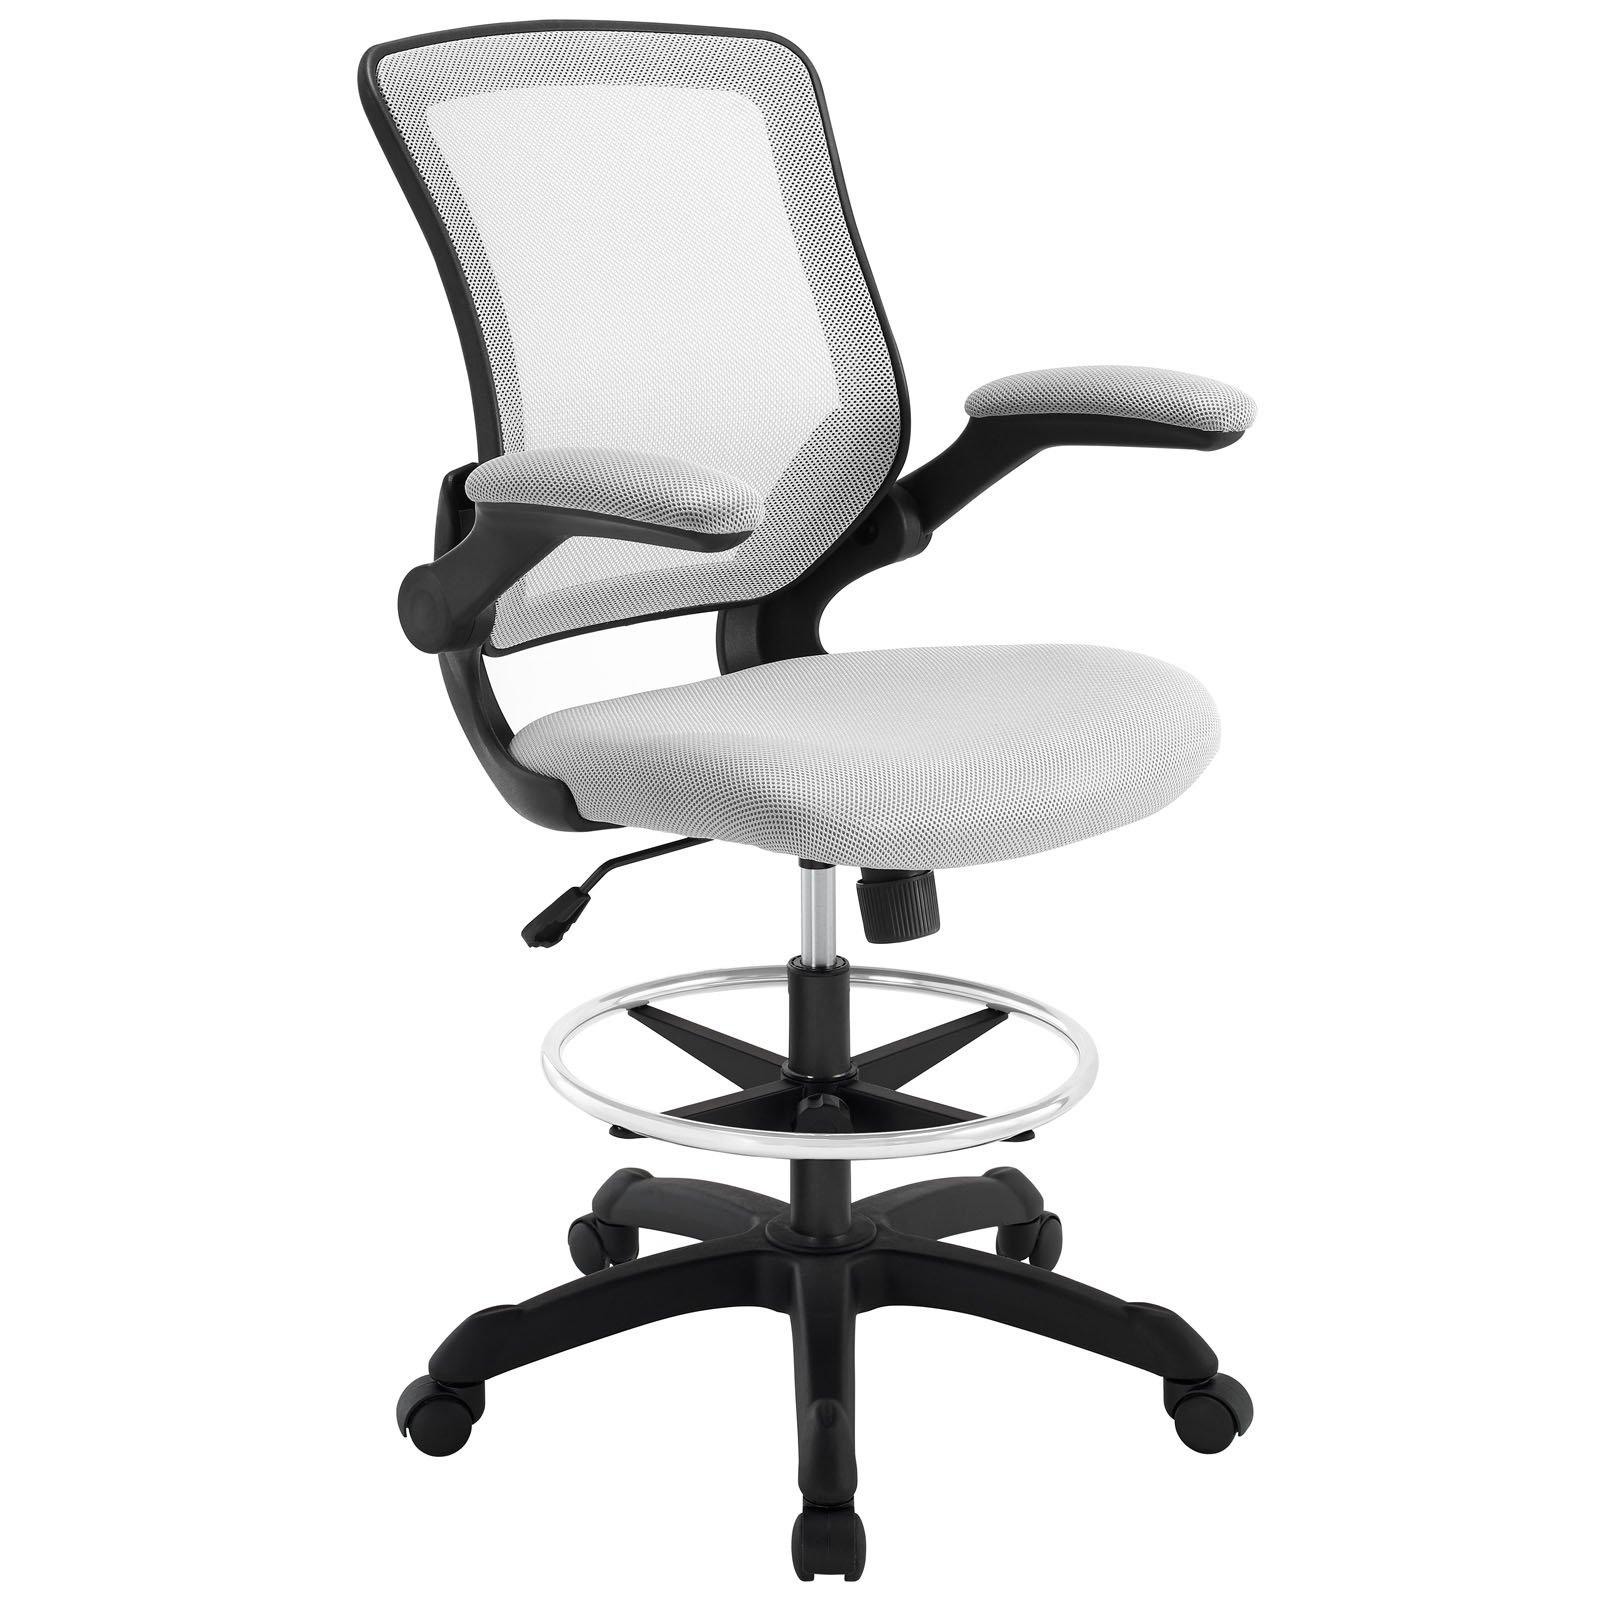 Modway Veer Drafting Stool-Chair (26L x 26W x 49.5H), Gray